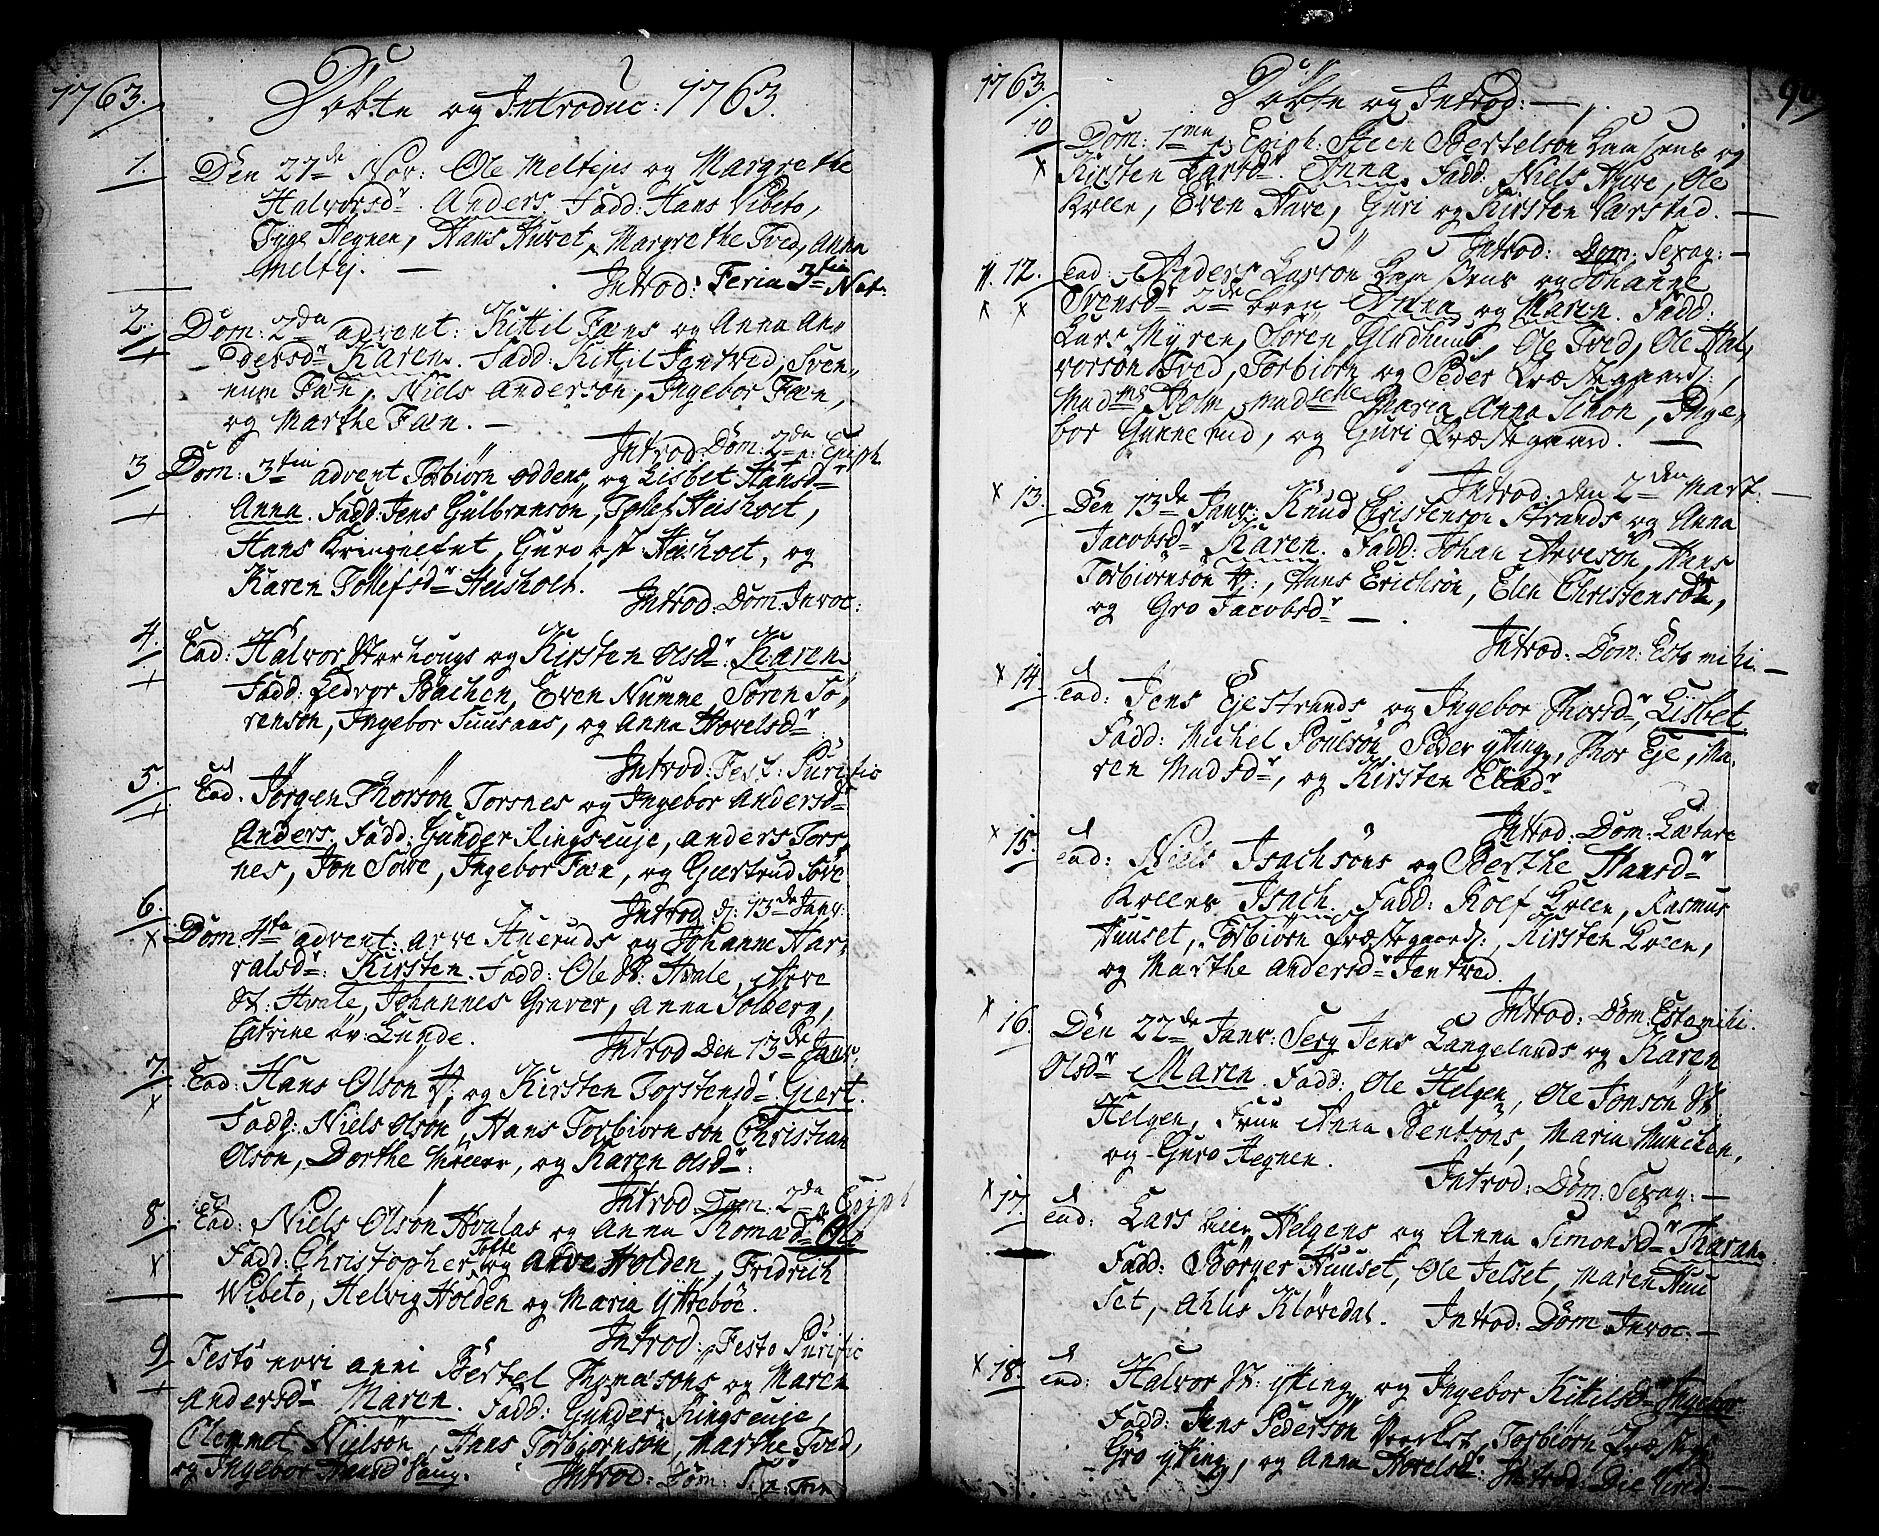 SAKO, Holla kirkebøker, F/Fa/L0001: Ministerialbok nr. 1, 1717-1779, s. 90